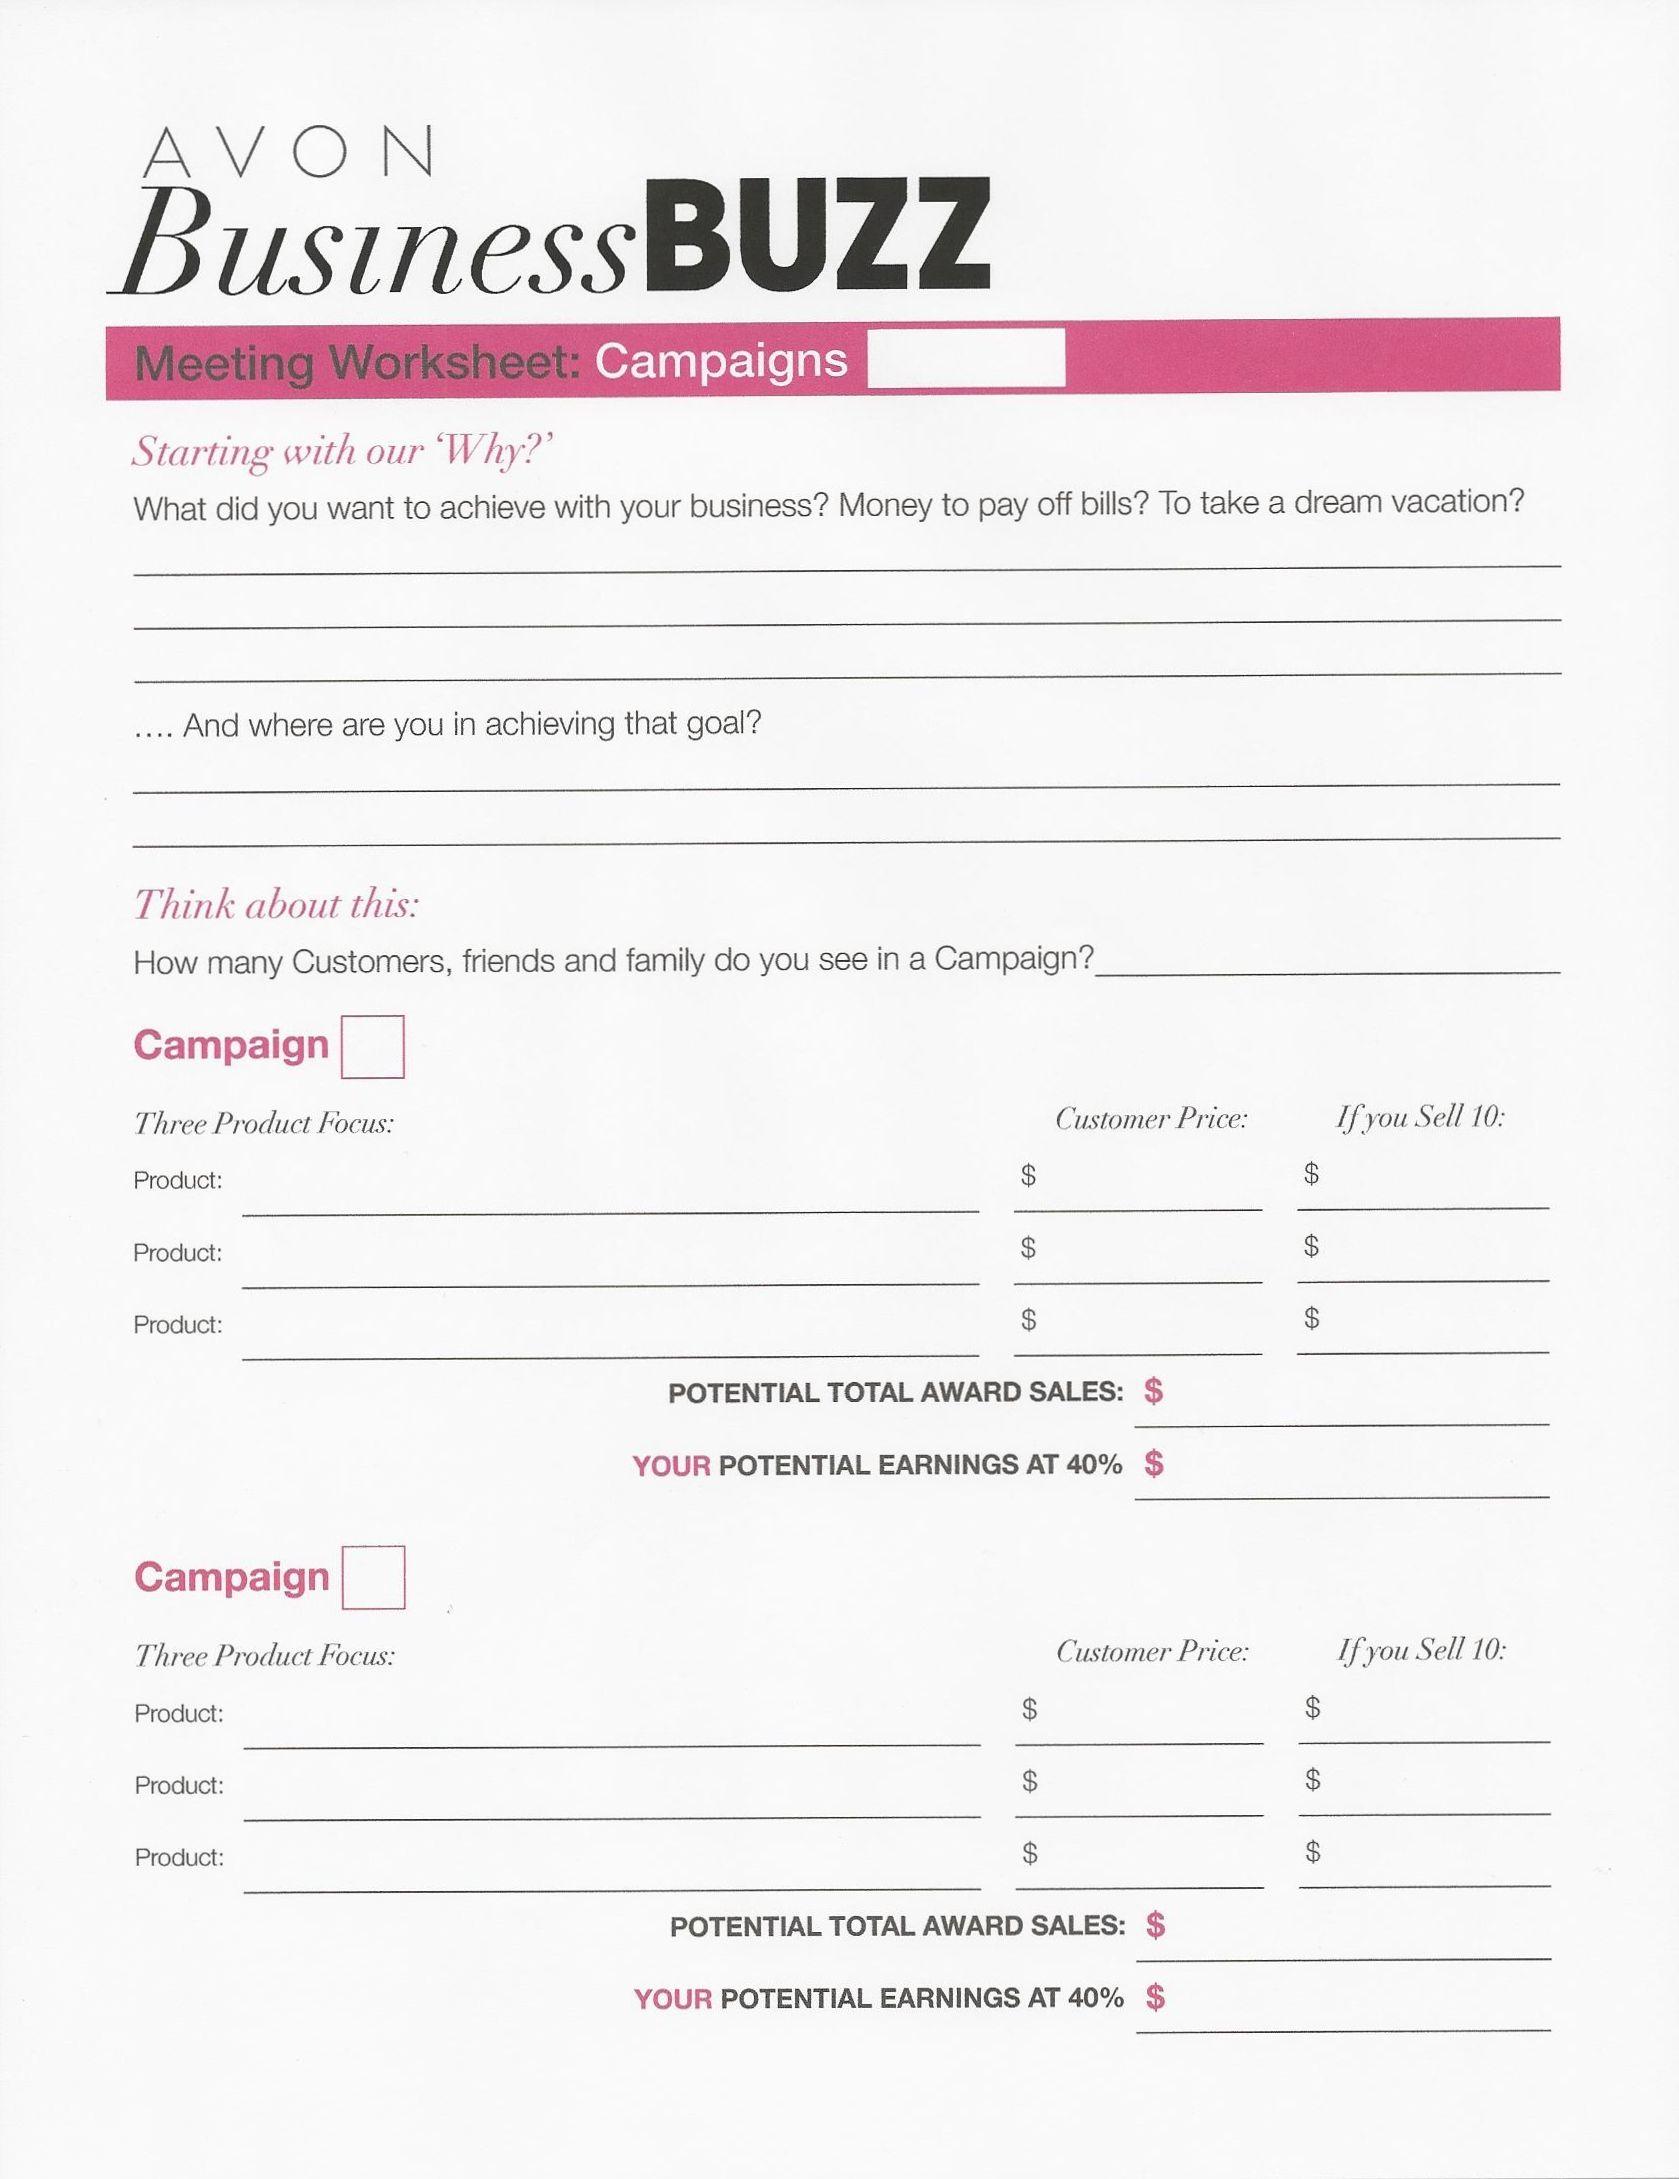 Business Buzz Worksheet 1 679 2 179 Pixels